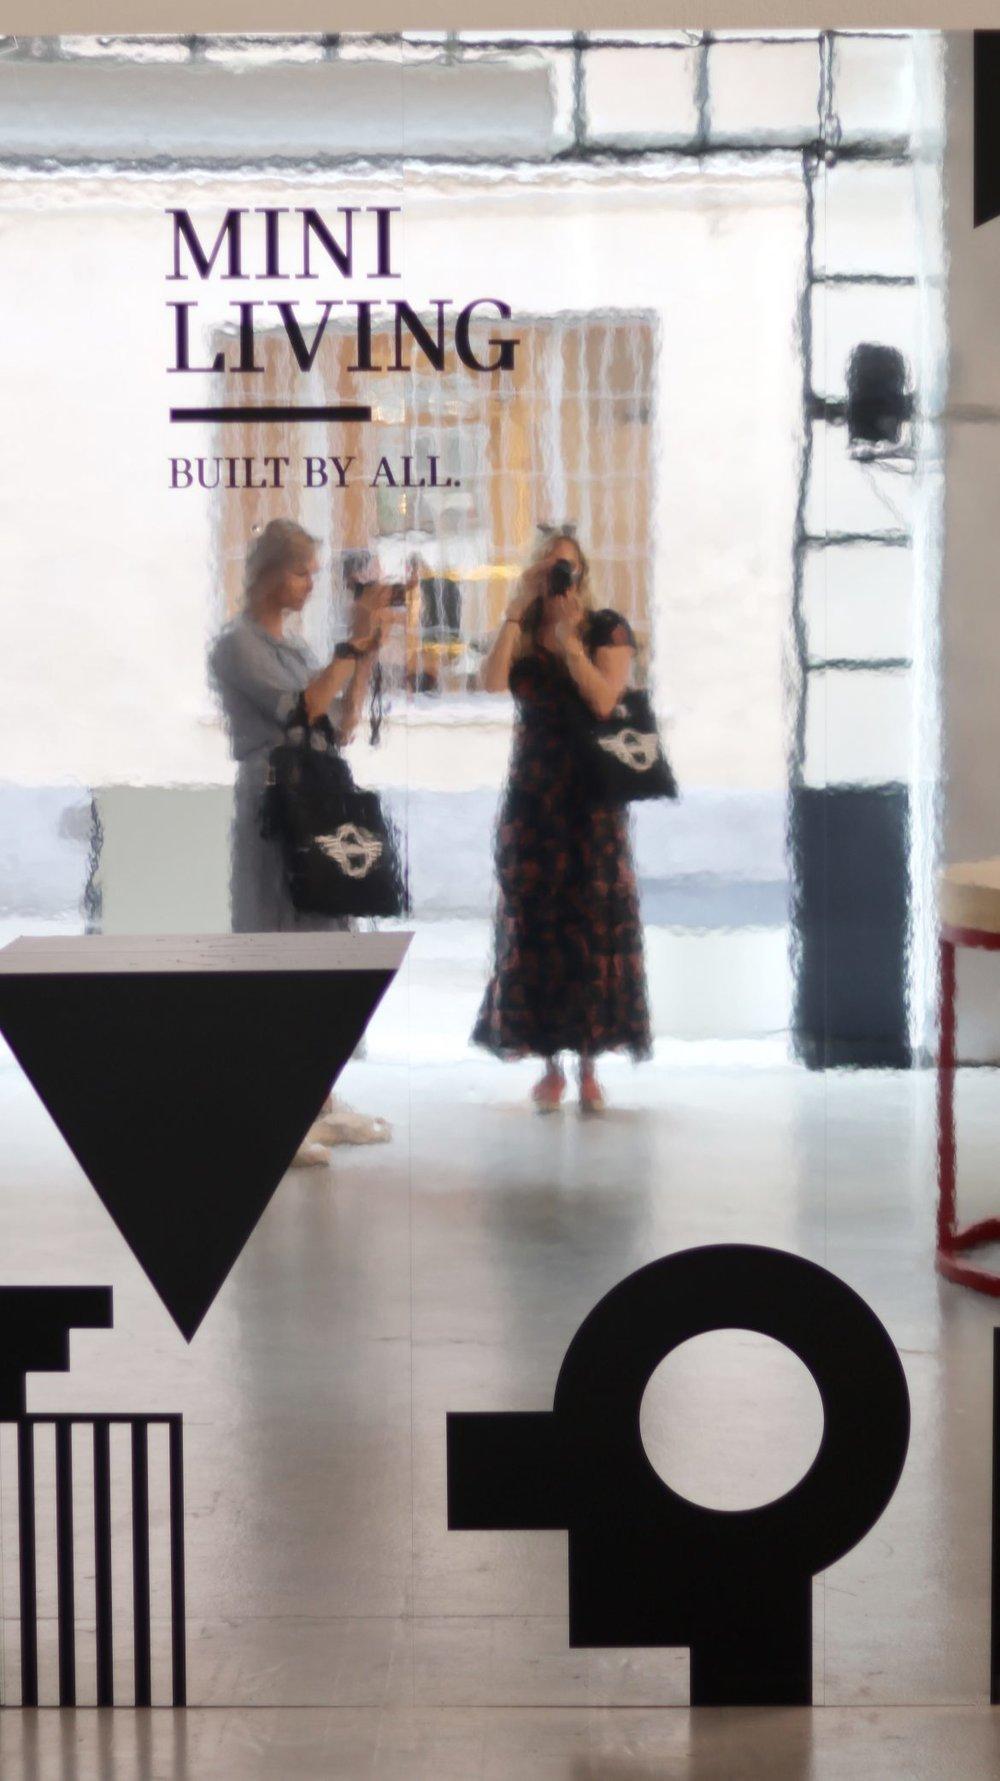 MINI-Living-Milan-Factory-of-Ideas-Anne-Catherine-Gerets-Droïka-Engelen-1170x2084.jpg